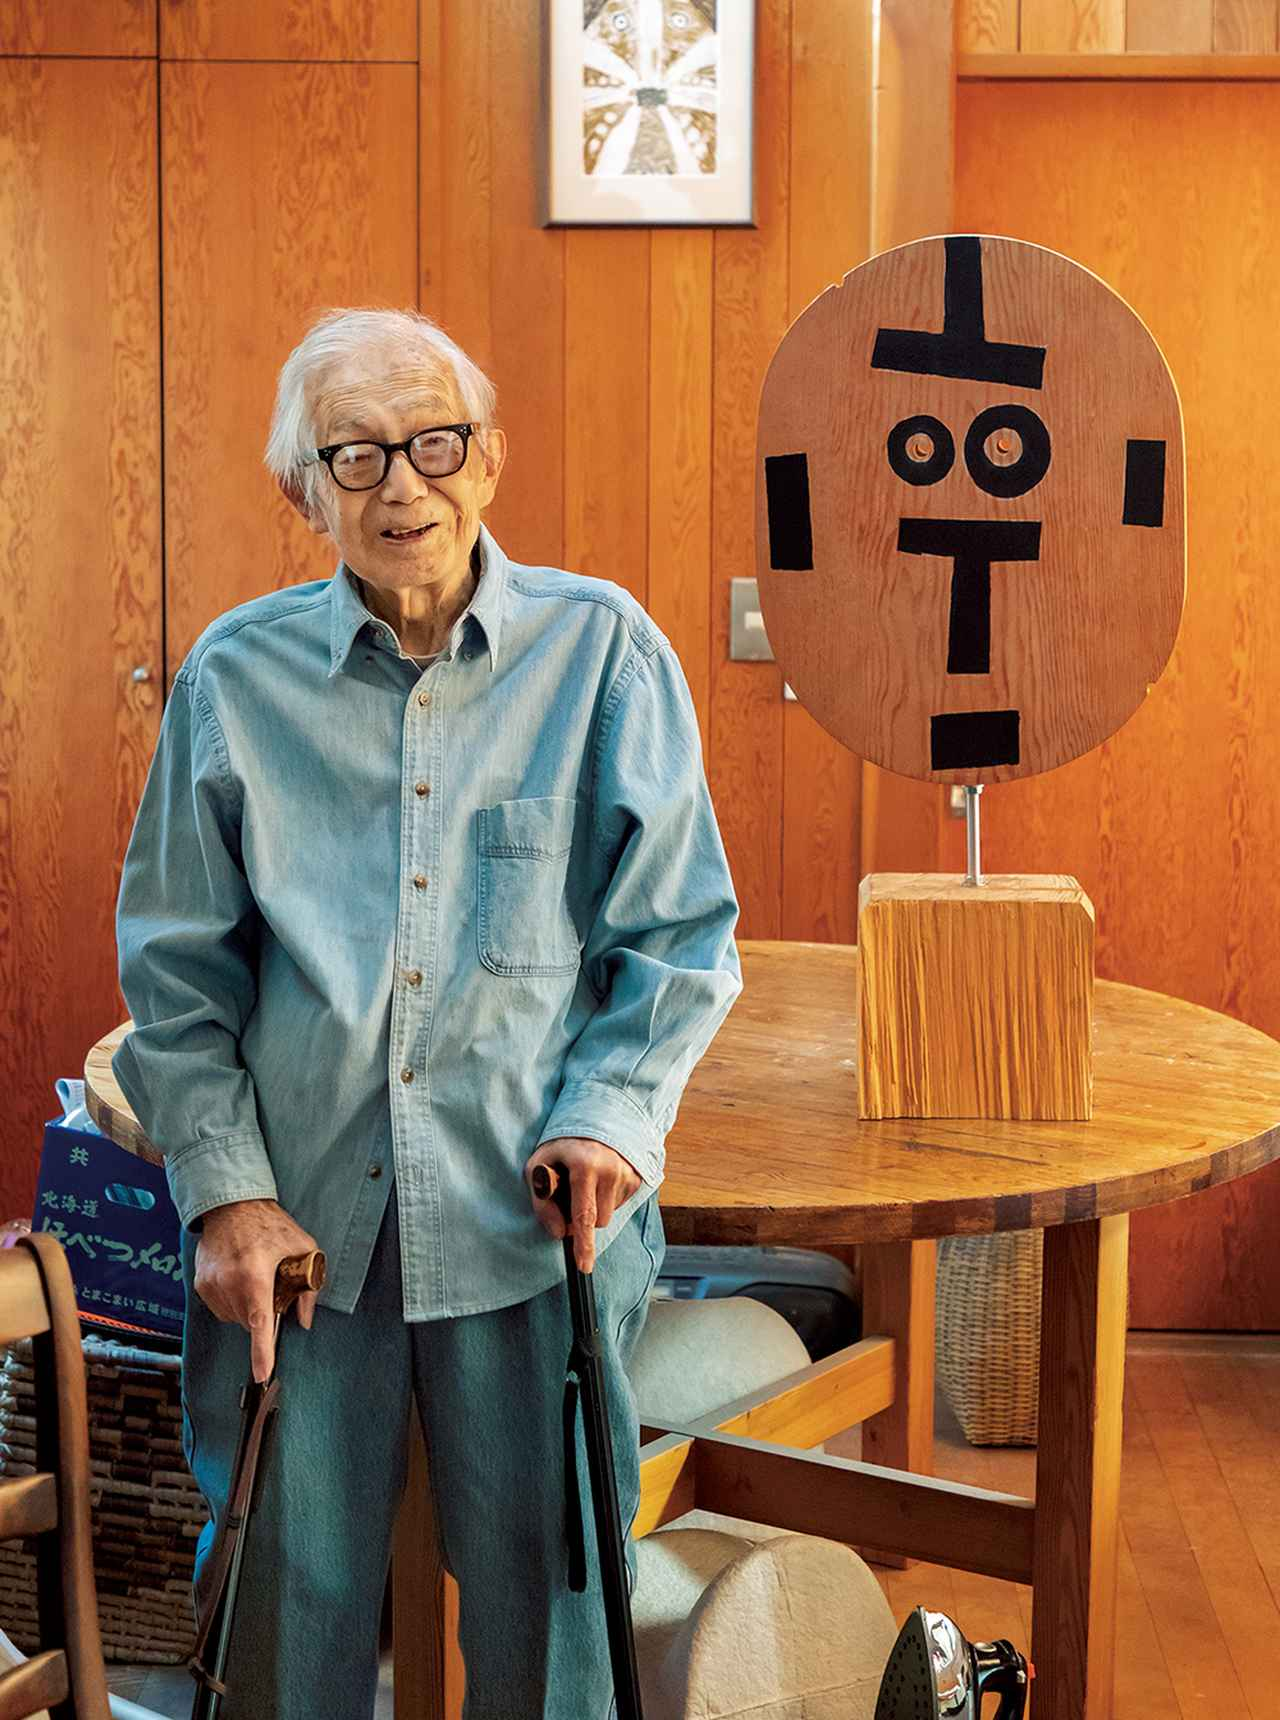 Images : 7番目の画像 - 「染色家、柚木沙弥郎 96歳の進行形」のアルバム - T JAPAN:The New York Times Style Magazine 公式サイト